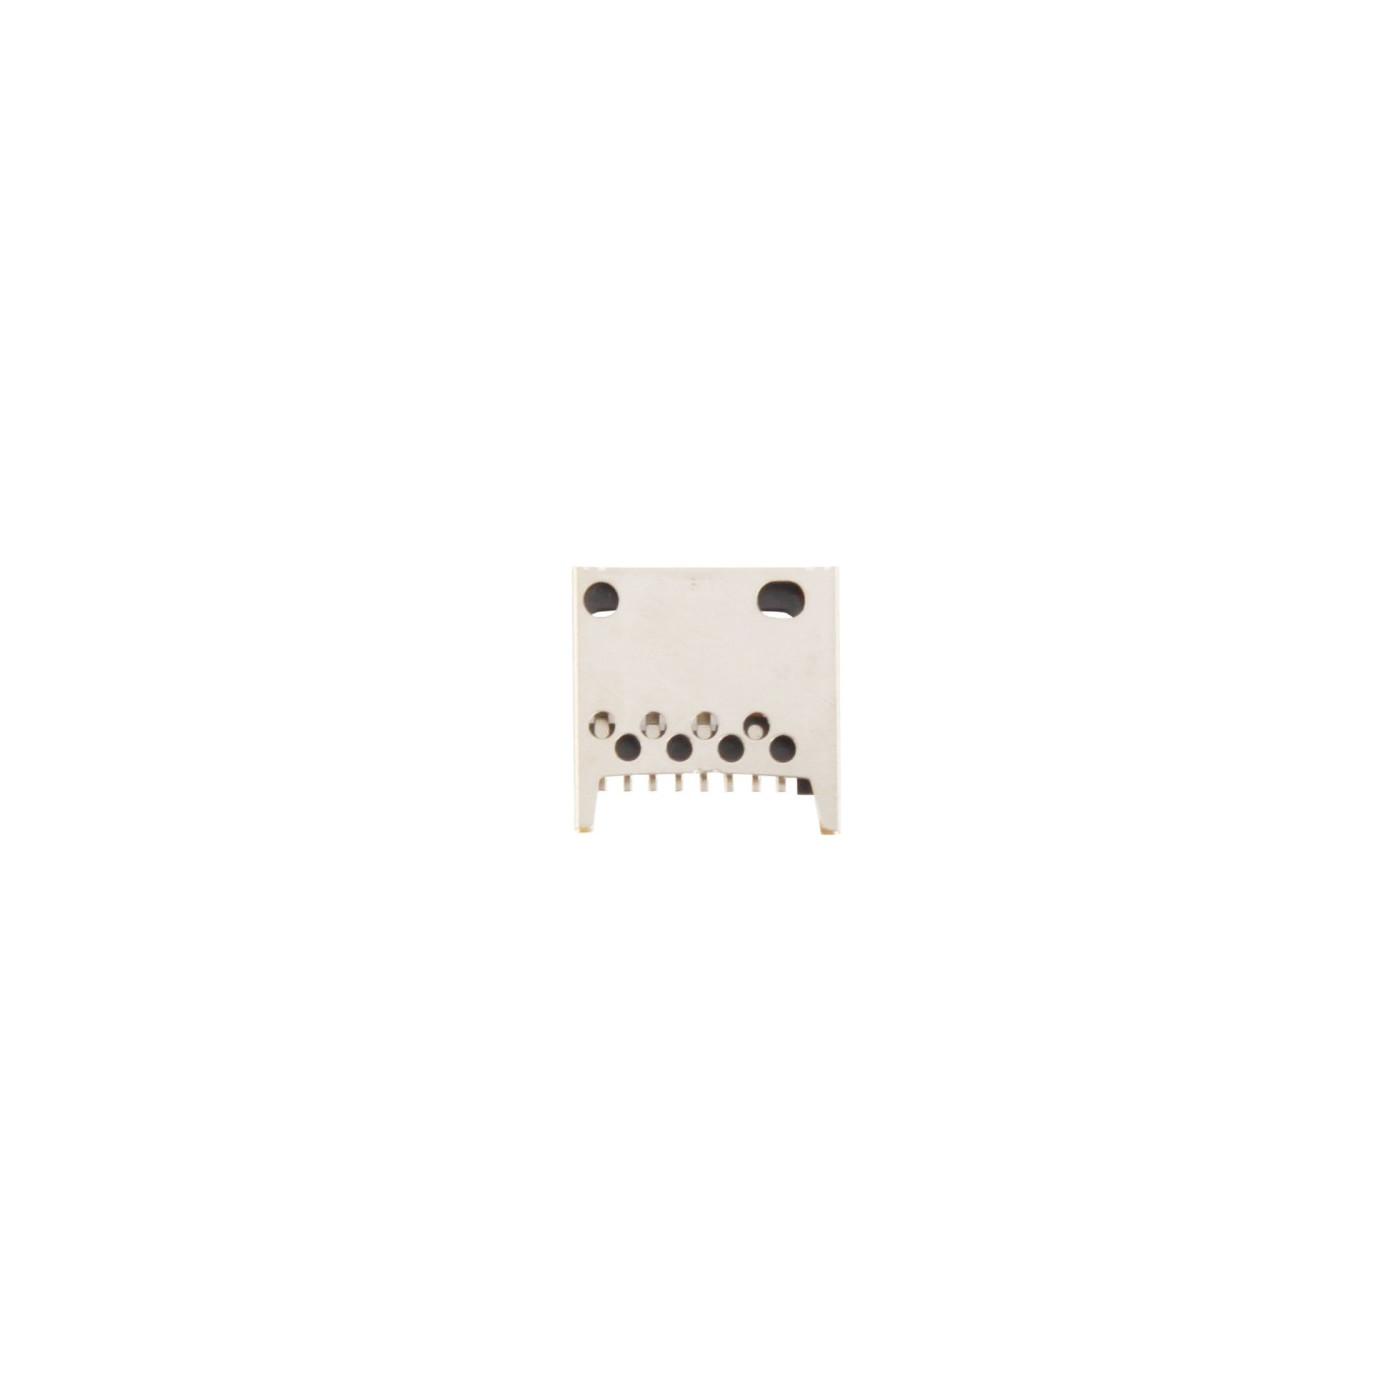 Player card slot sim card for Sony Ericsson Xperia Arc S